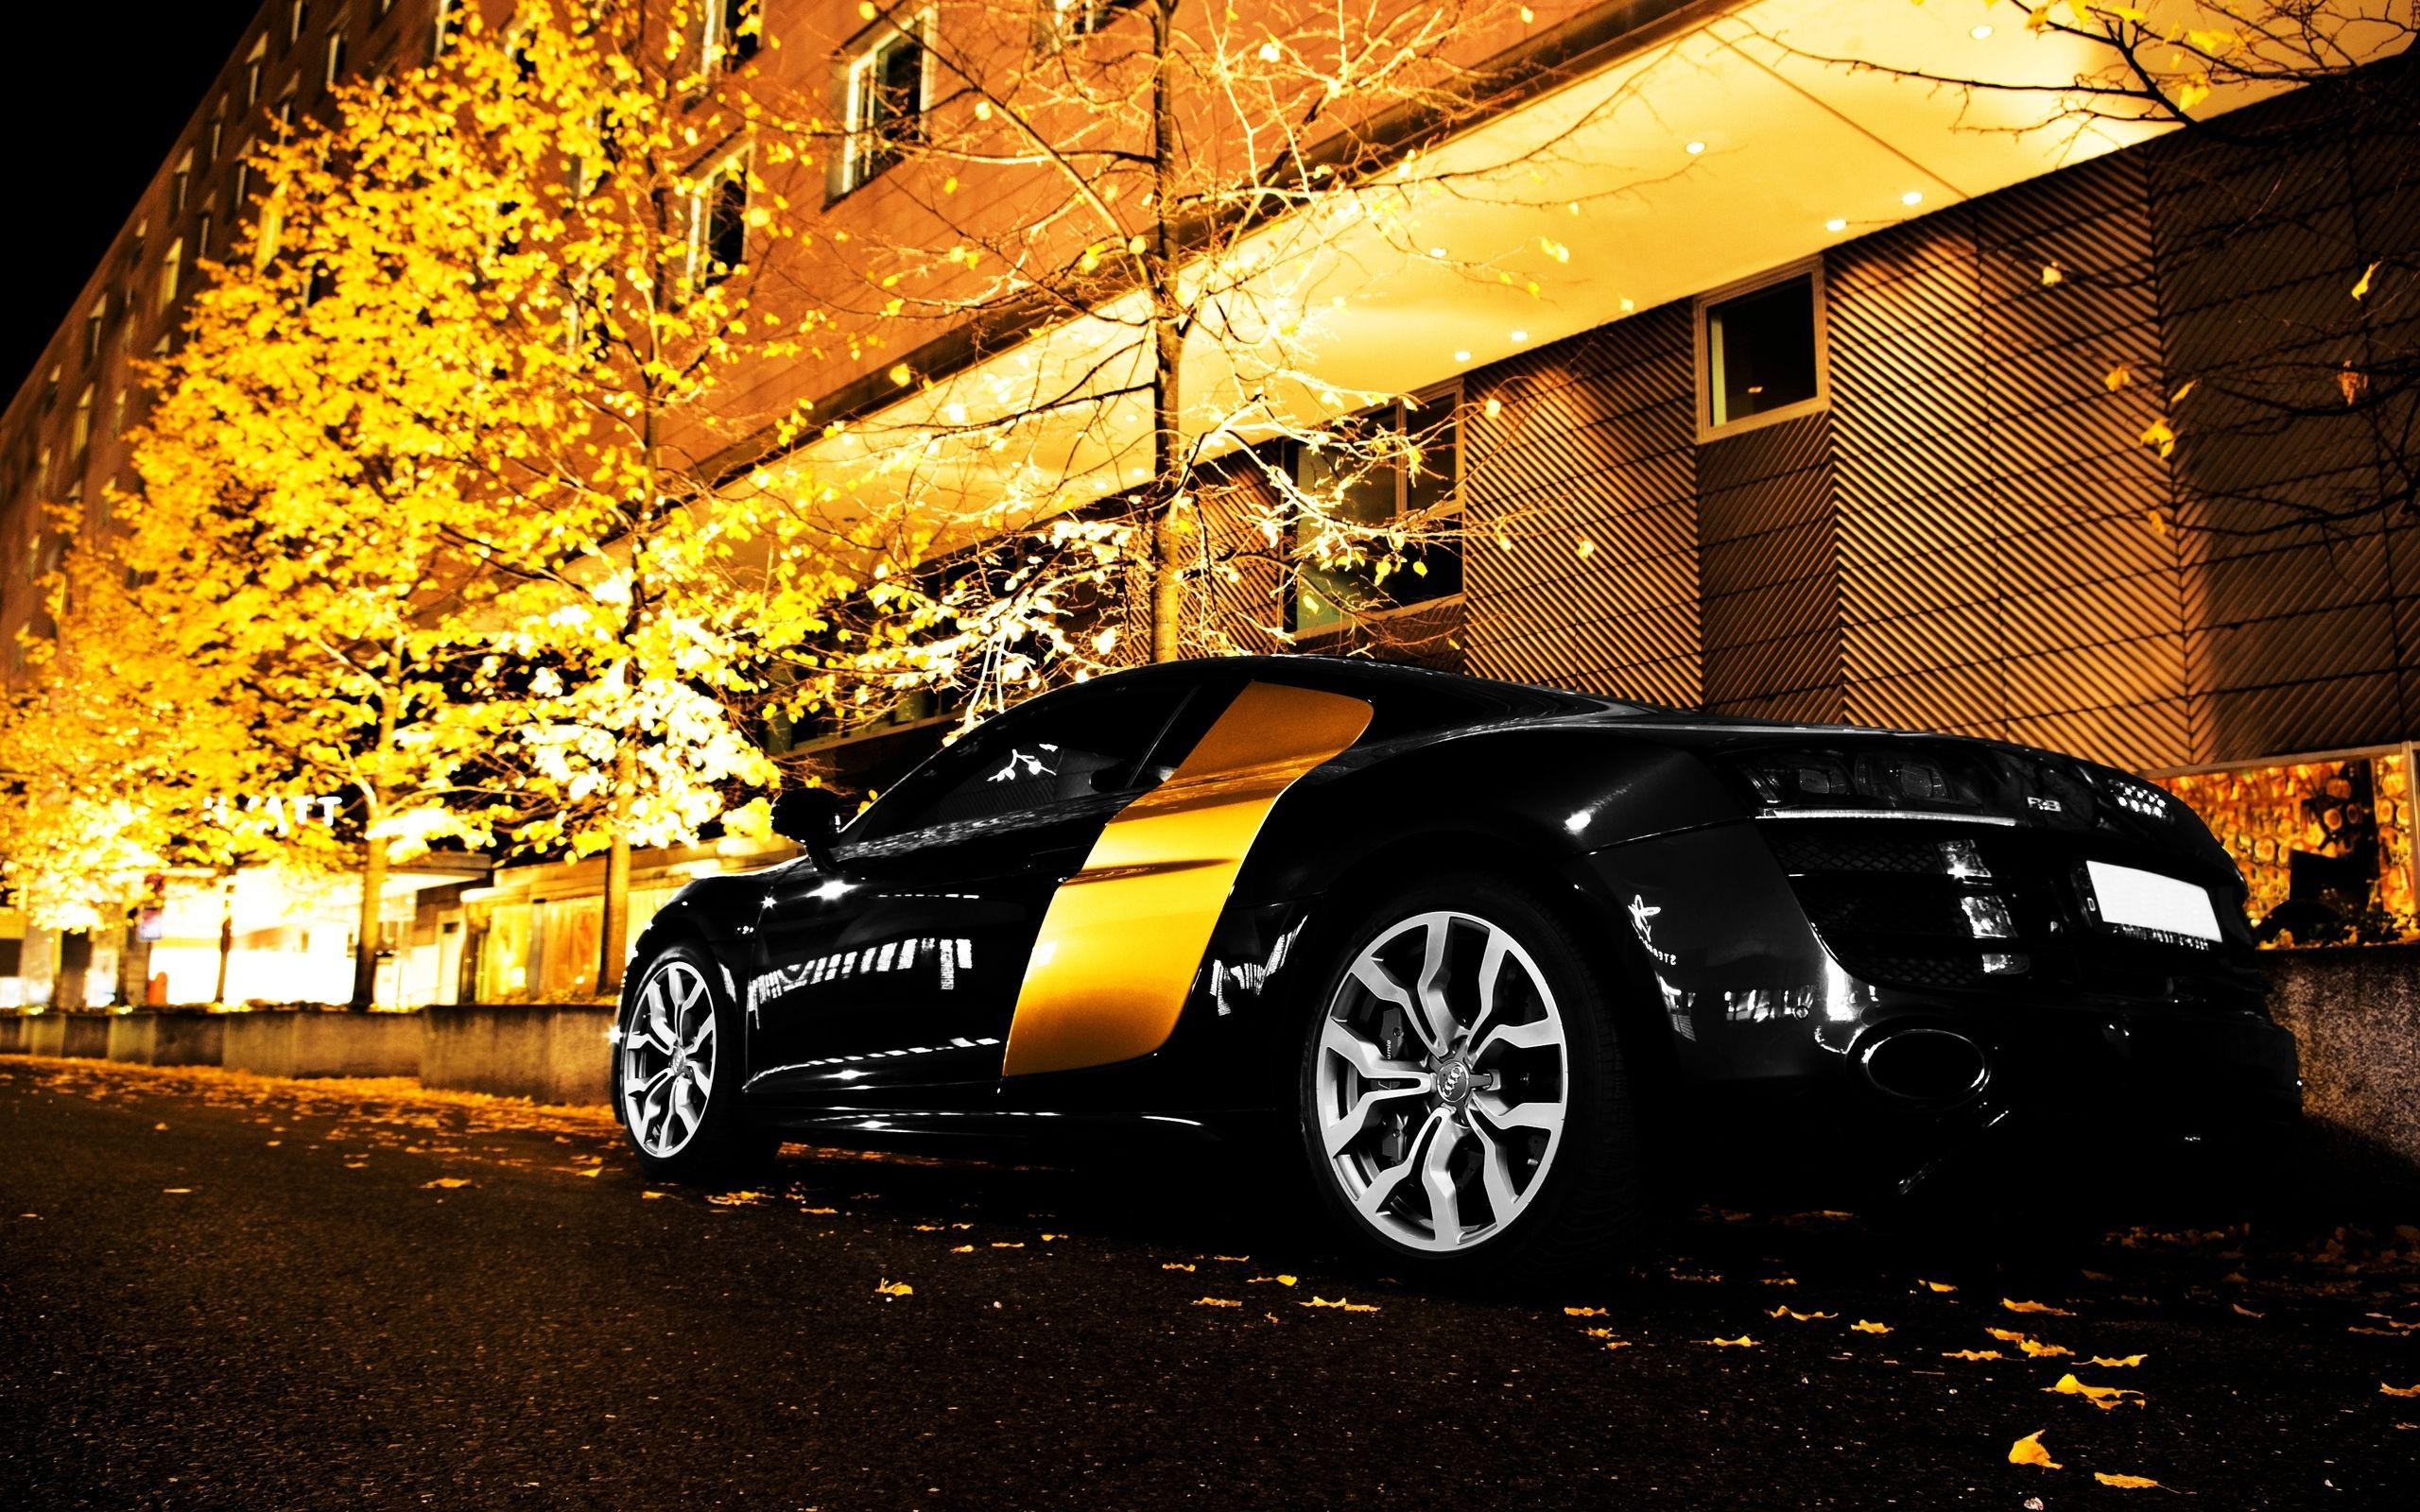 Audi R8 Wallpaper Black Http Whatstrendingonline Com Audi R8 Wallpaper Black Hd Wallpapers Of Cars Car Wallpapers Cool Car Wallpapers Hd